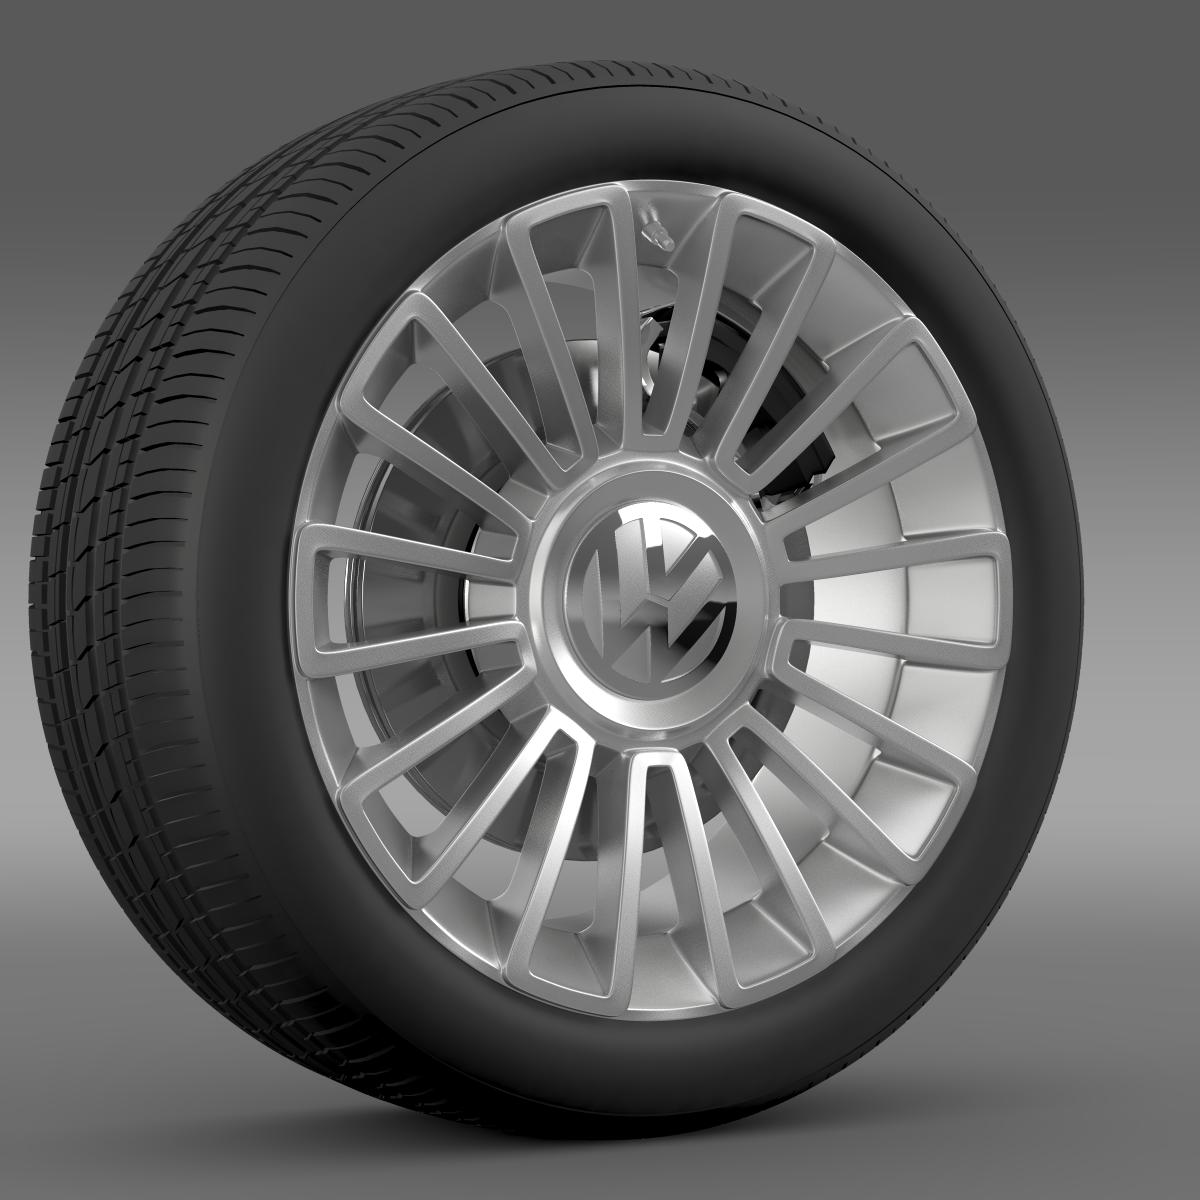 volkswagen up wheel 3d model 3ds max fbx c4d lwo ma mb hrc xsi obj 210885